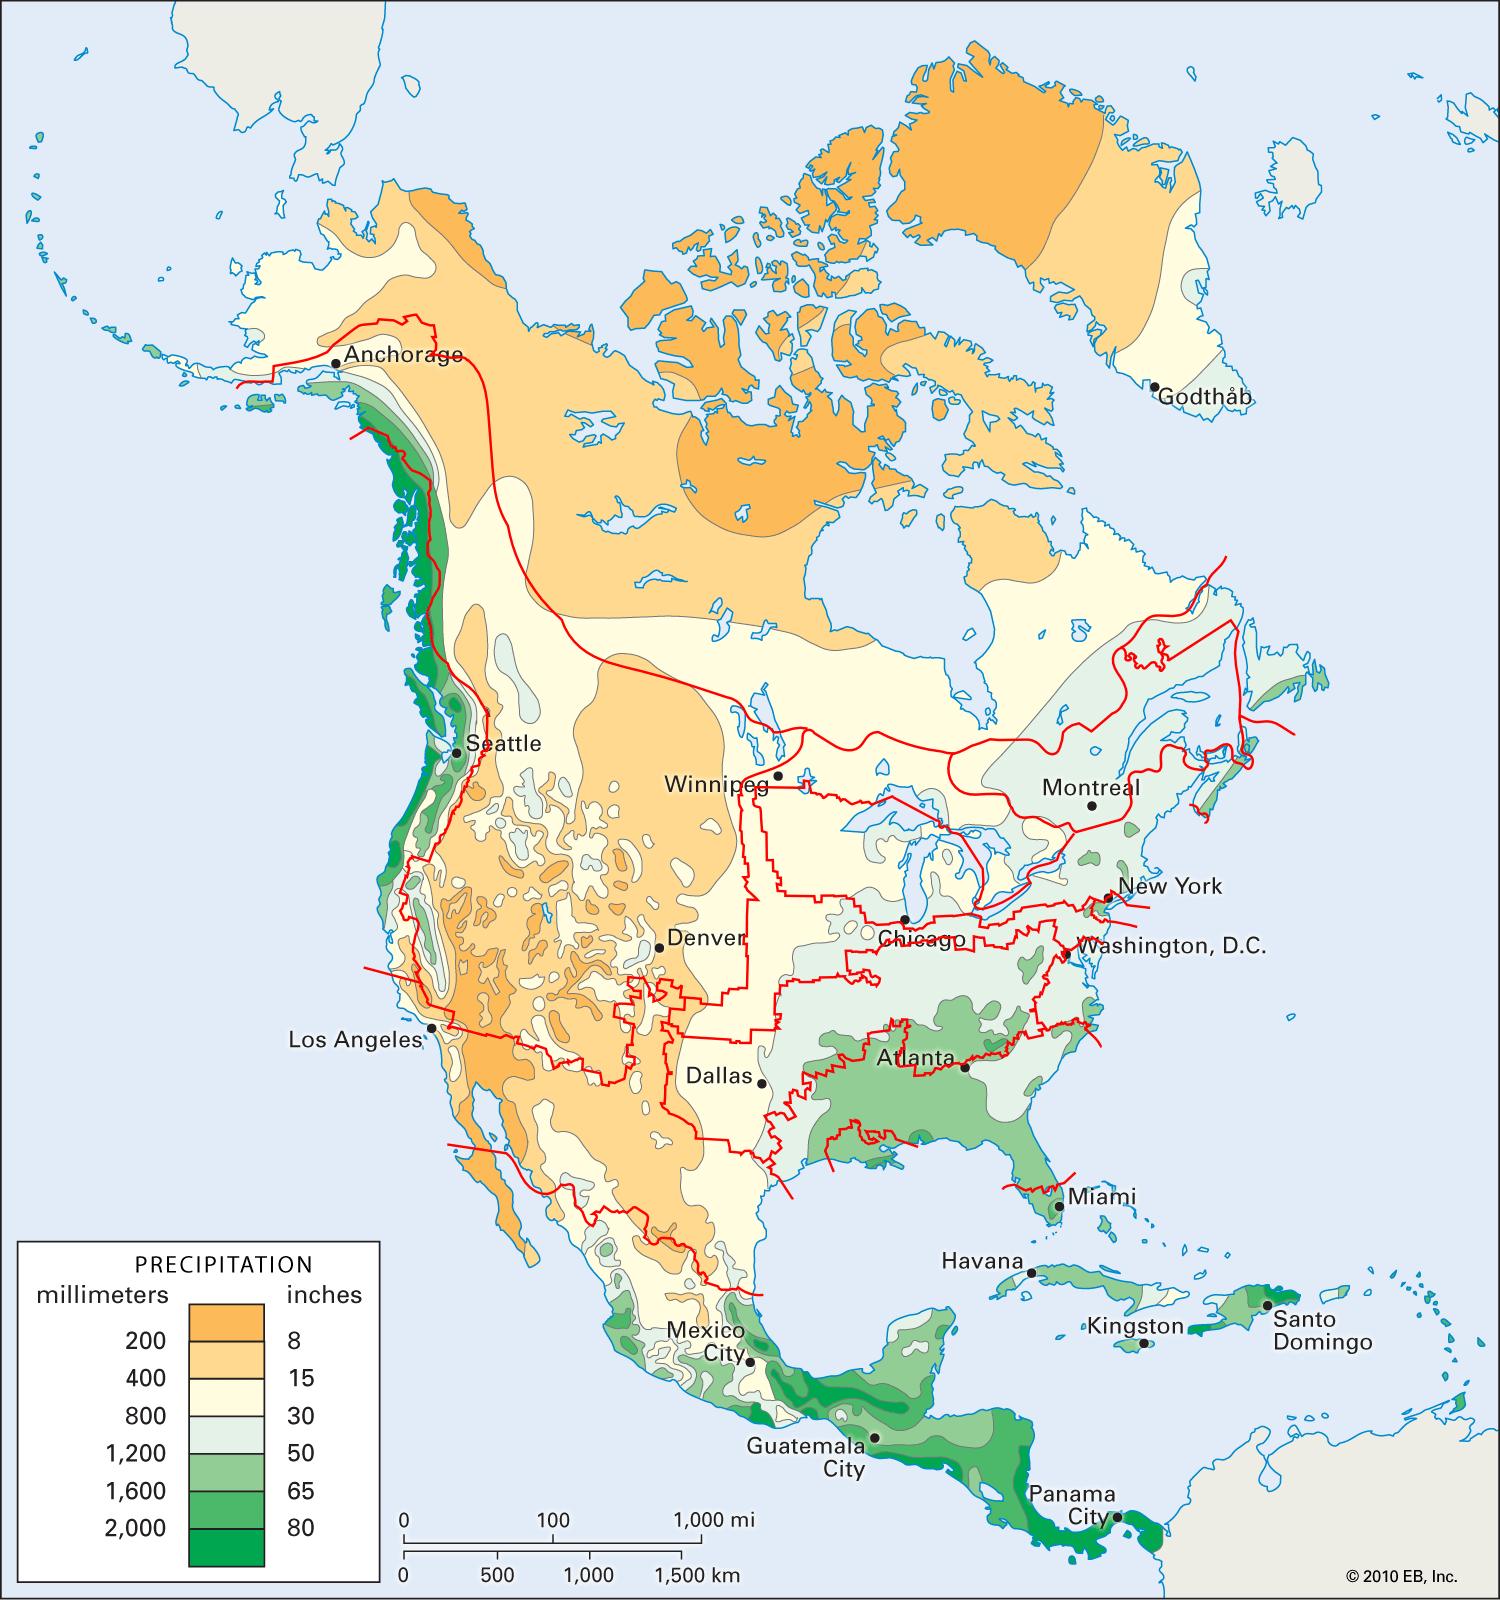 North American Nations Precip